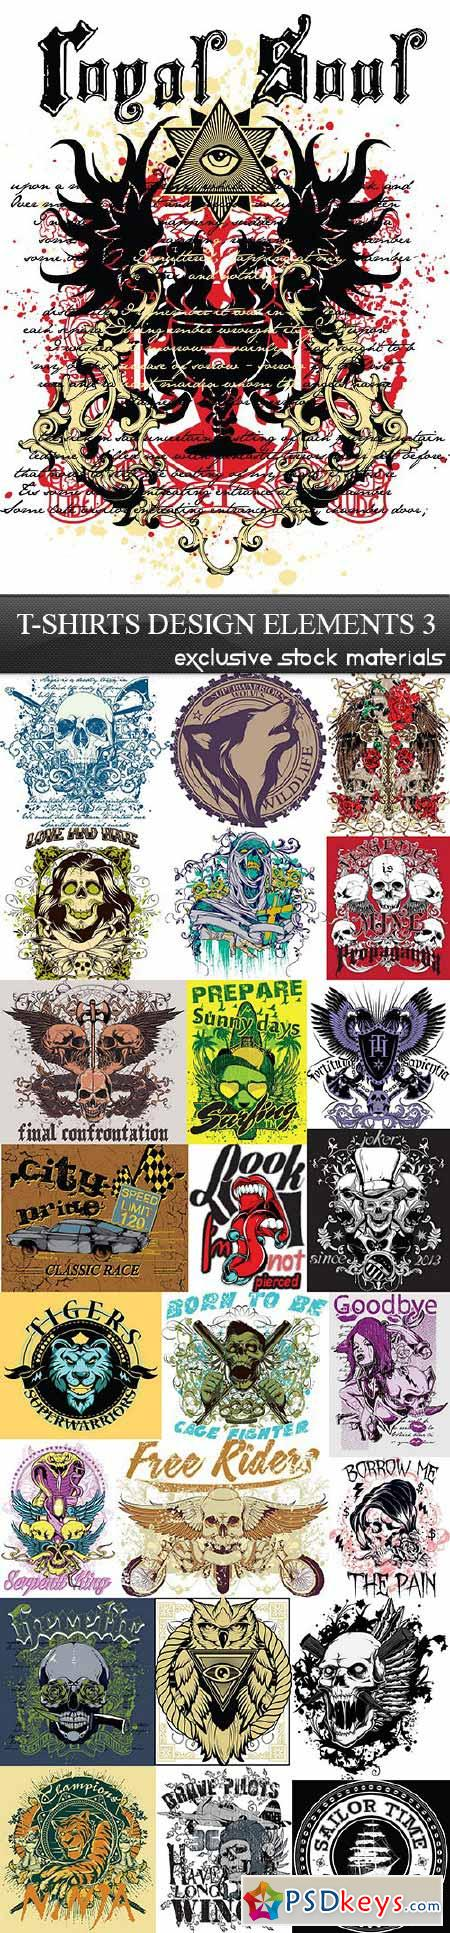 Shirt design eps - T Shirts Design Elements 3 25xeps